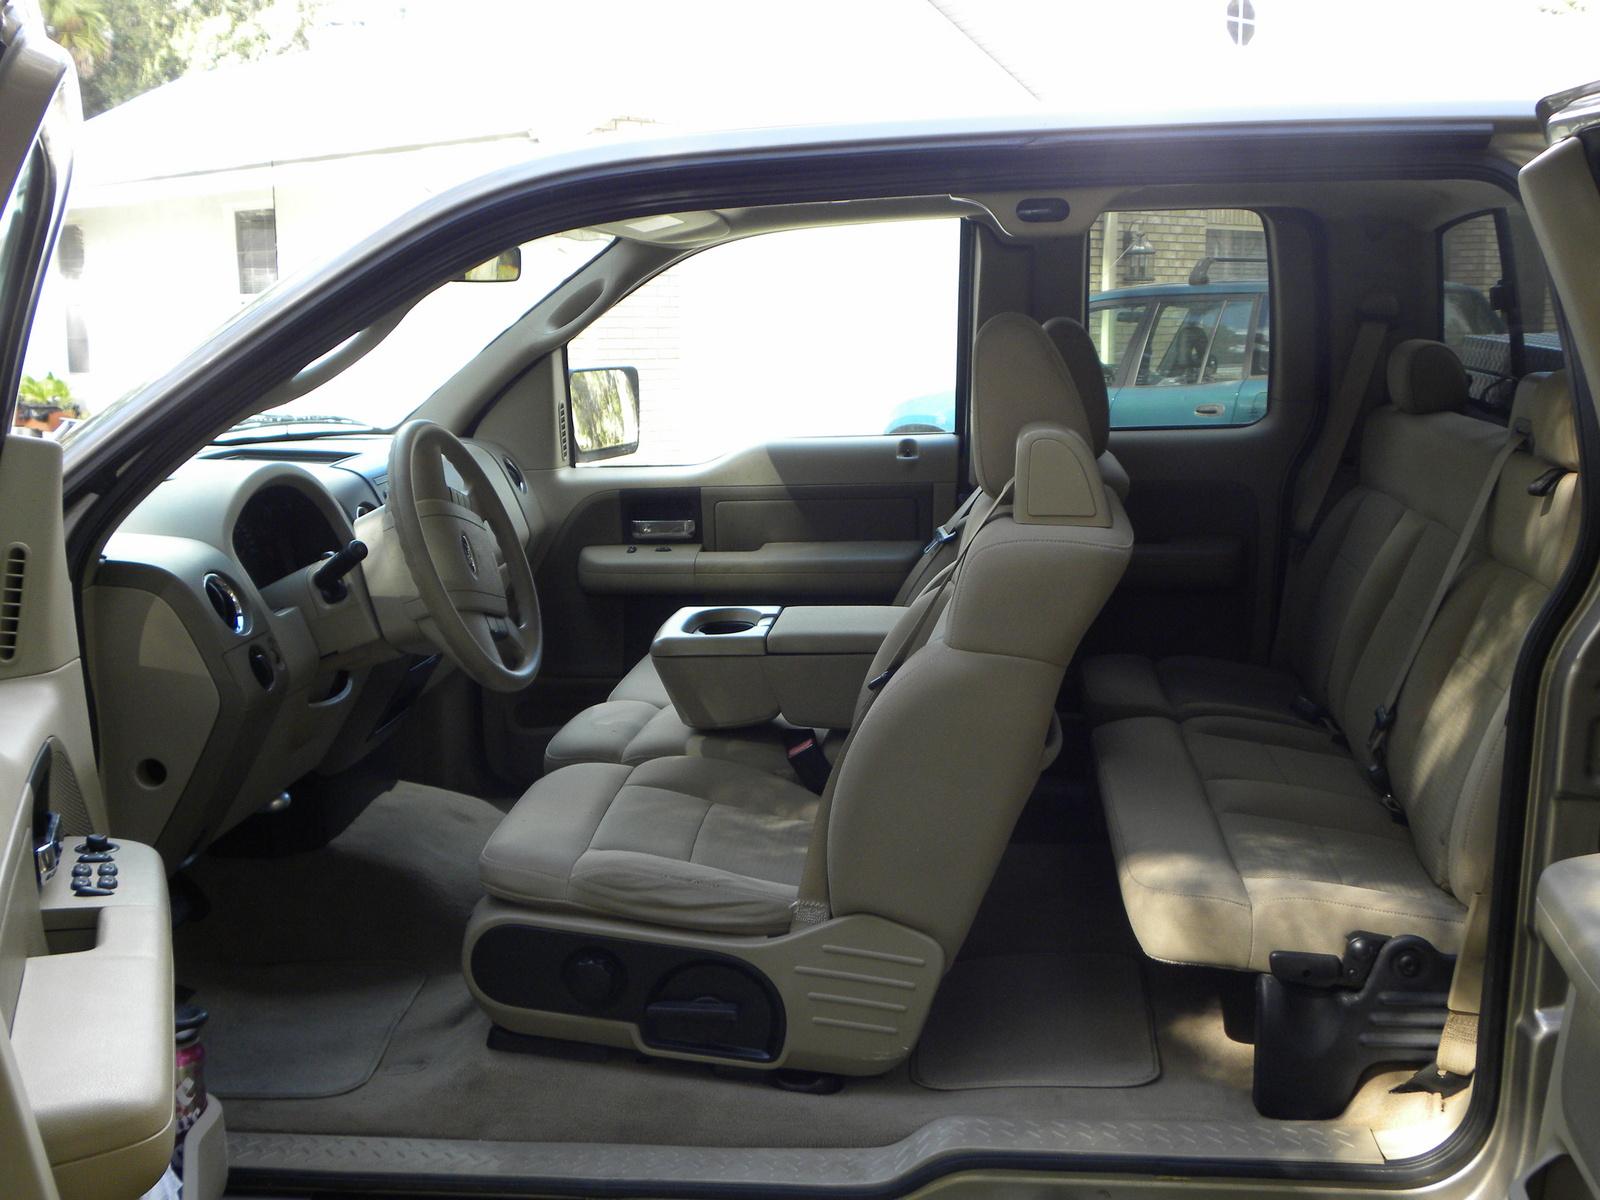 2004 ford f150 custom interior. Black Bedroom Furniture Sets. Home Design Ideas